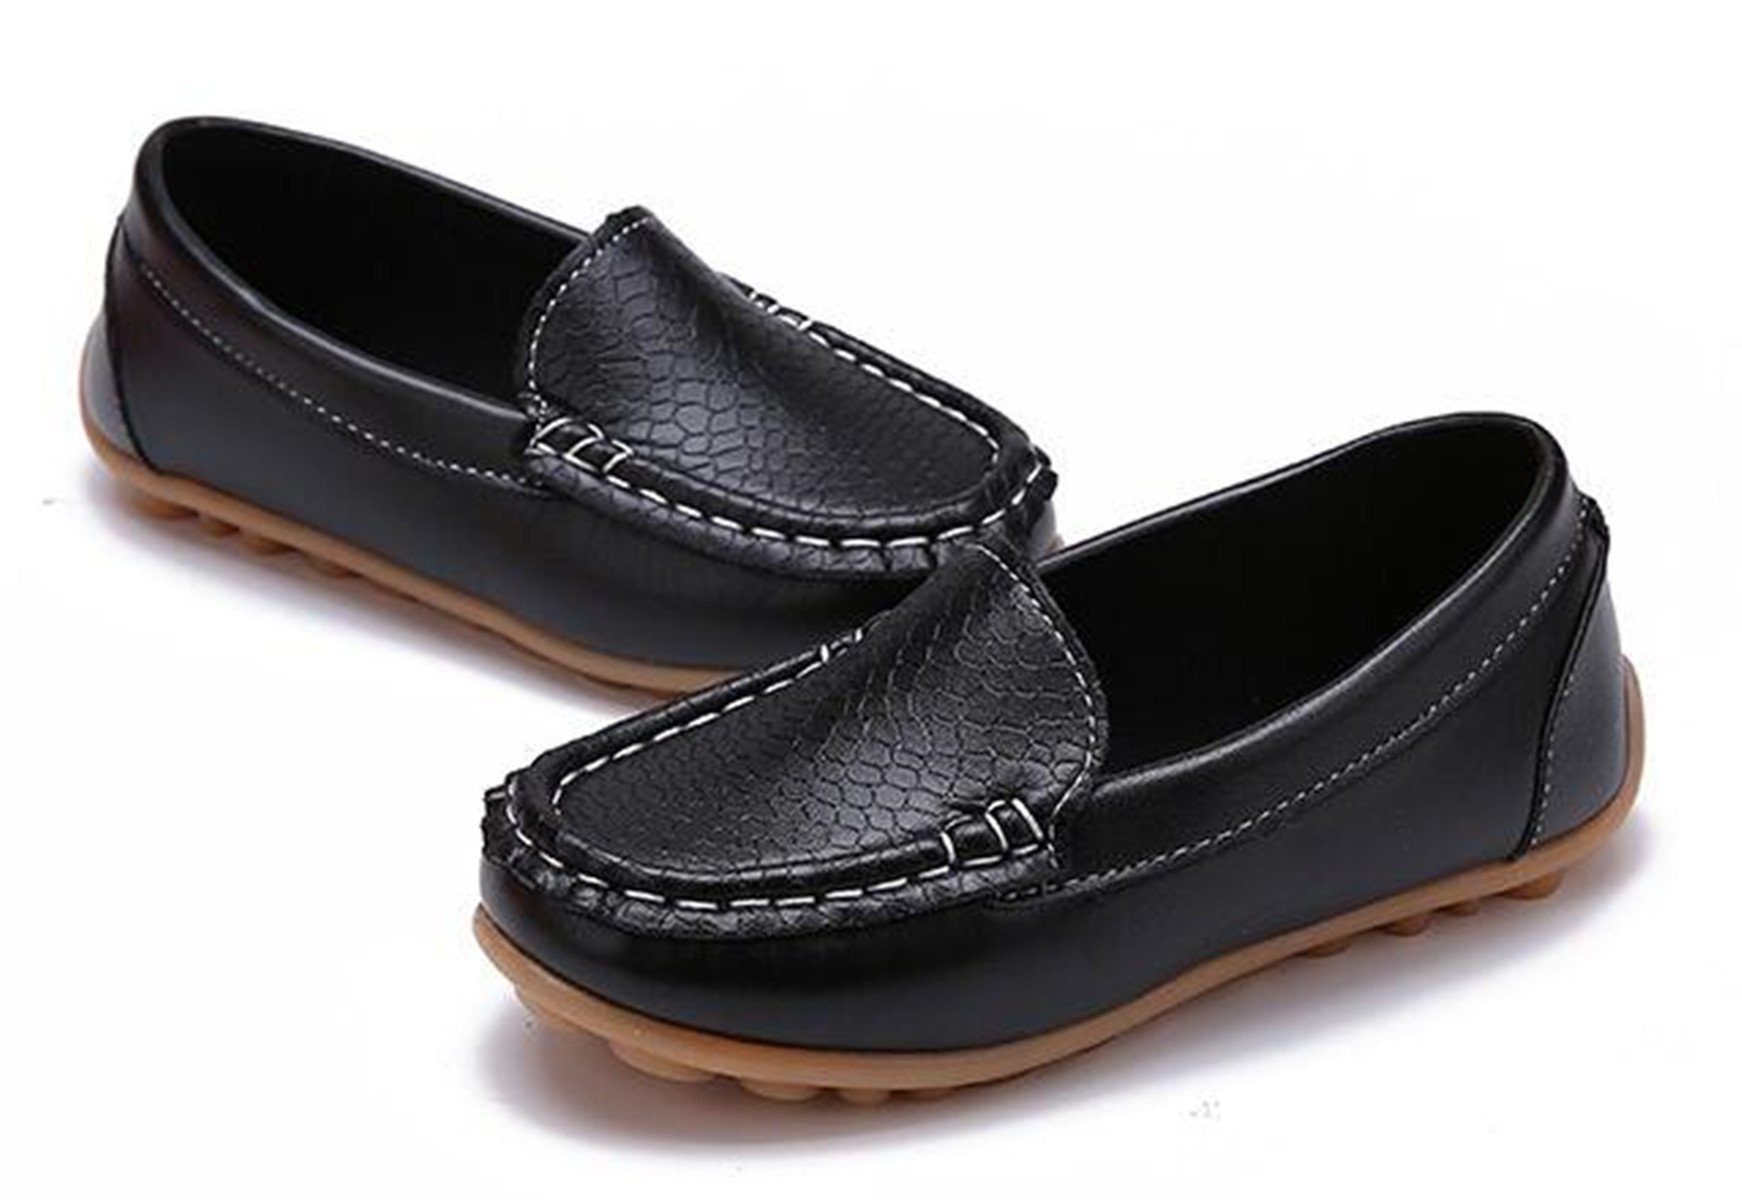 Sakuracan Boys Girls Leather Loafers Slip-on Boat Dress-Shoes (Toddler/Little Kid) by Sakuracan (Image #4)